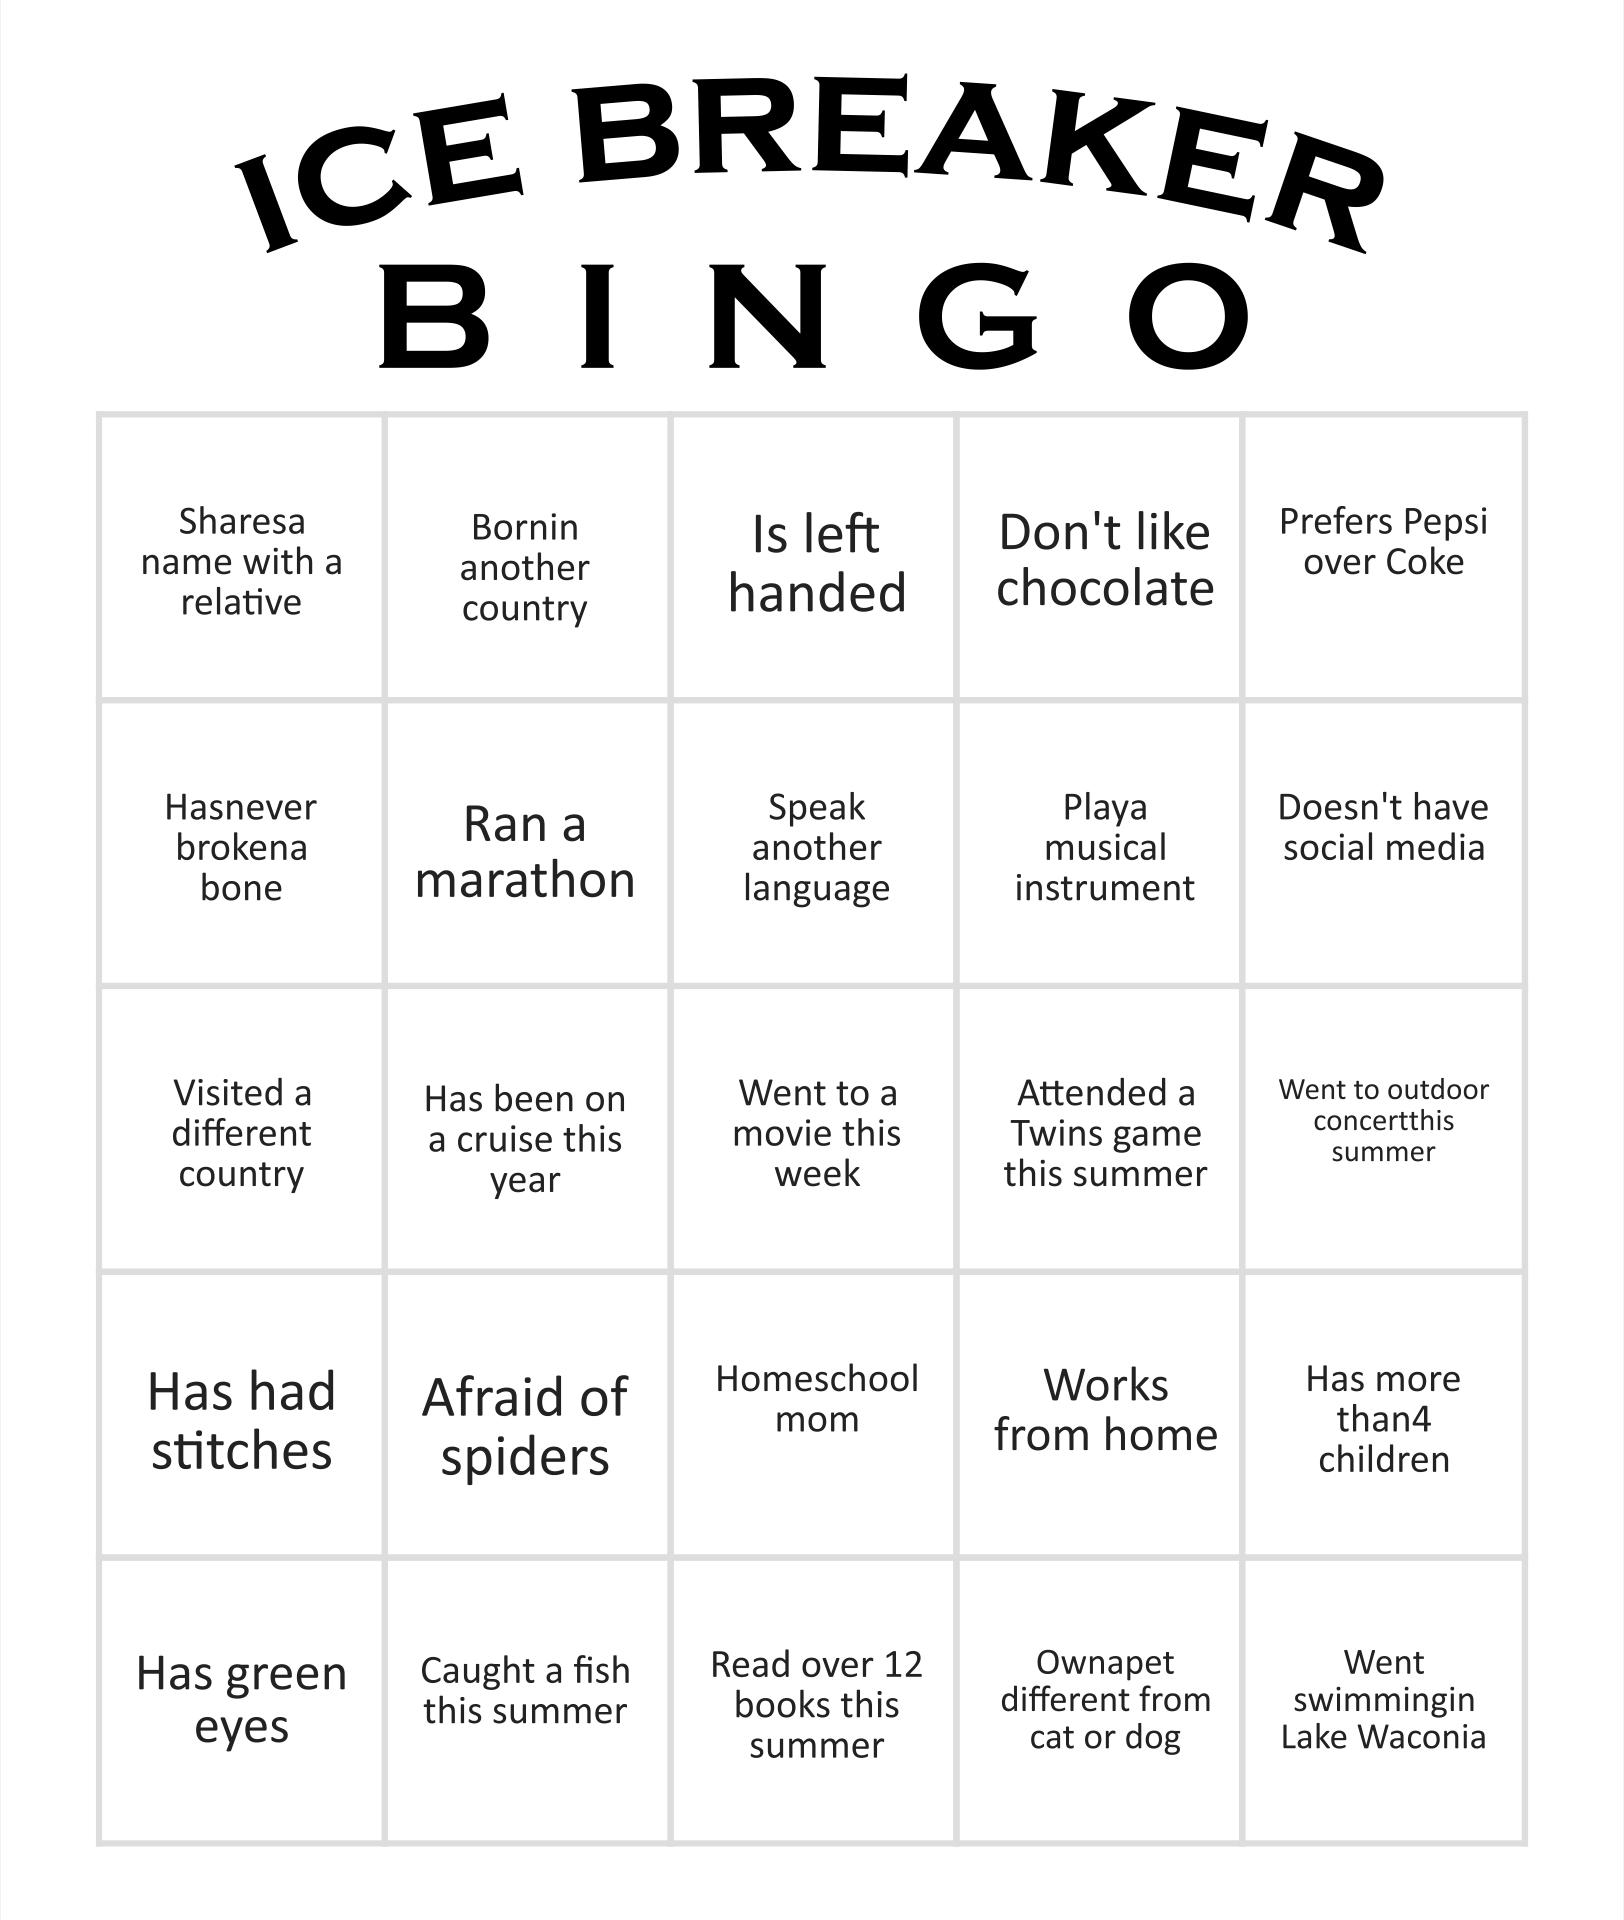 Ice Breaker Bingo Card Template